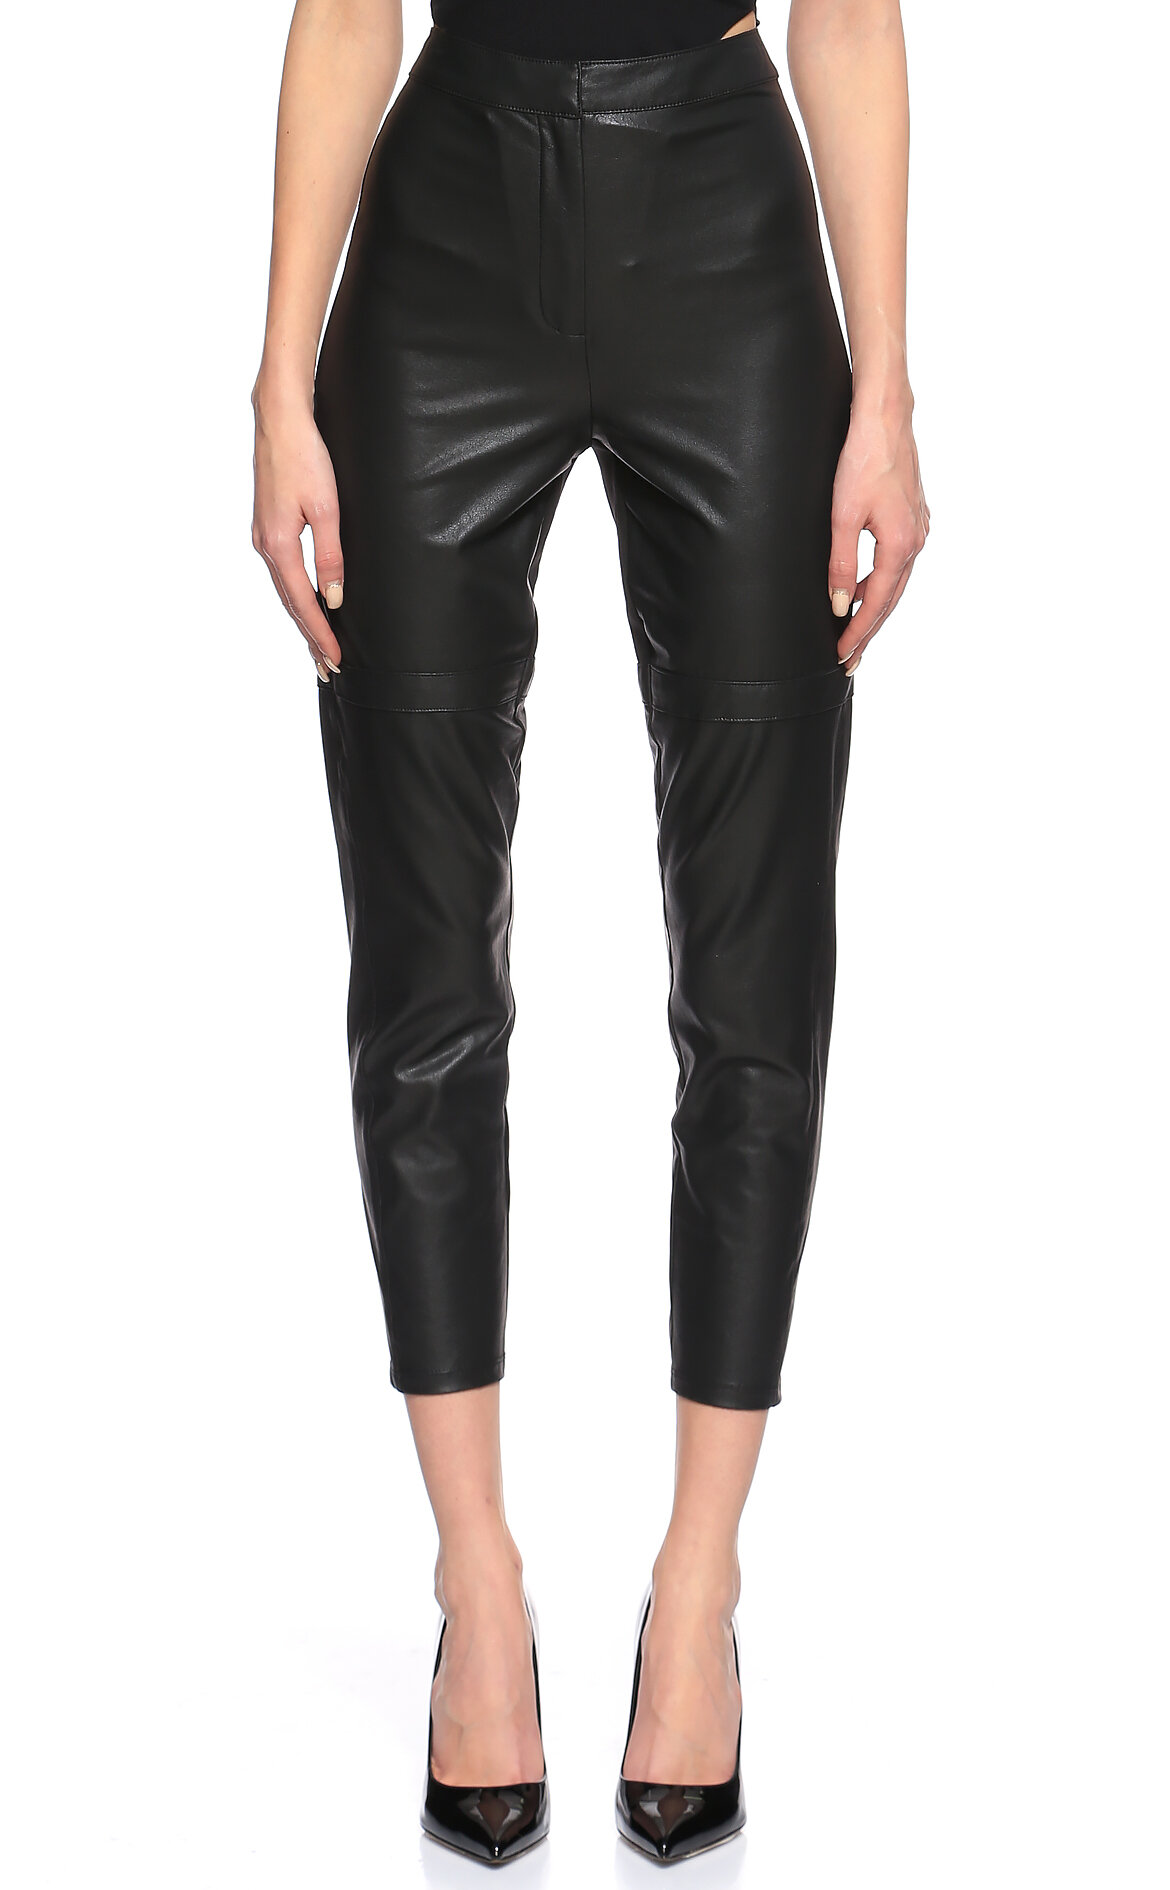 BCBG MAX AZRIA-BCBG MAX AZRIA Deri Detaylı Siyah Pantolon